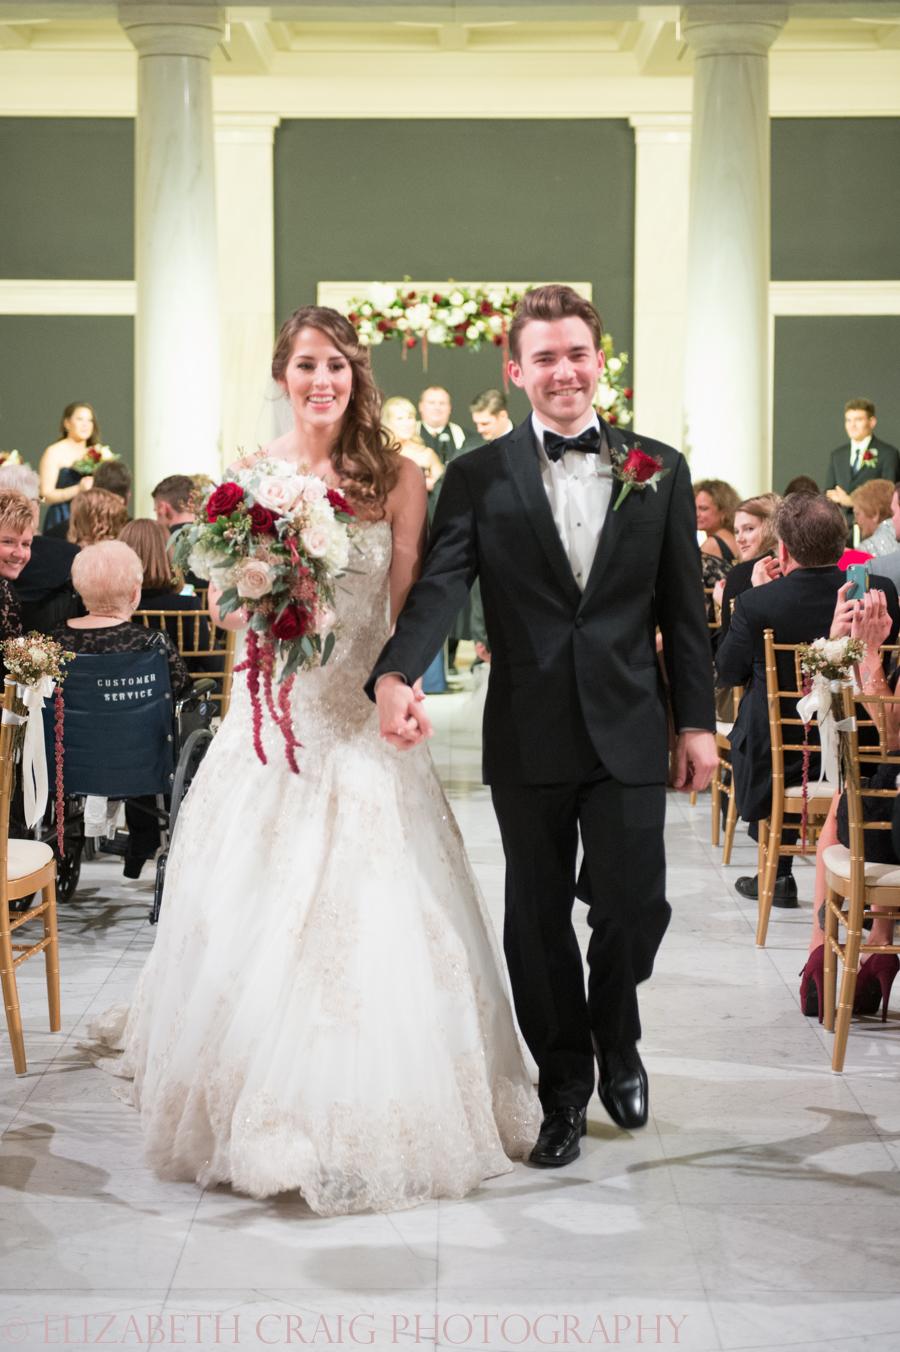 Carnegie Museum of Art Weddings | Elizabeth Craig Photography-0074